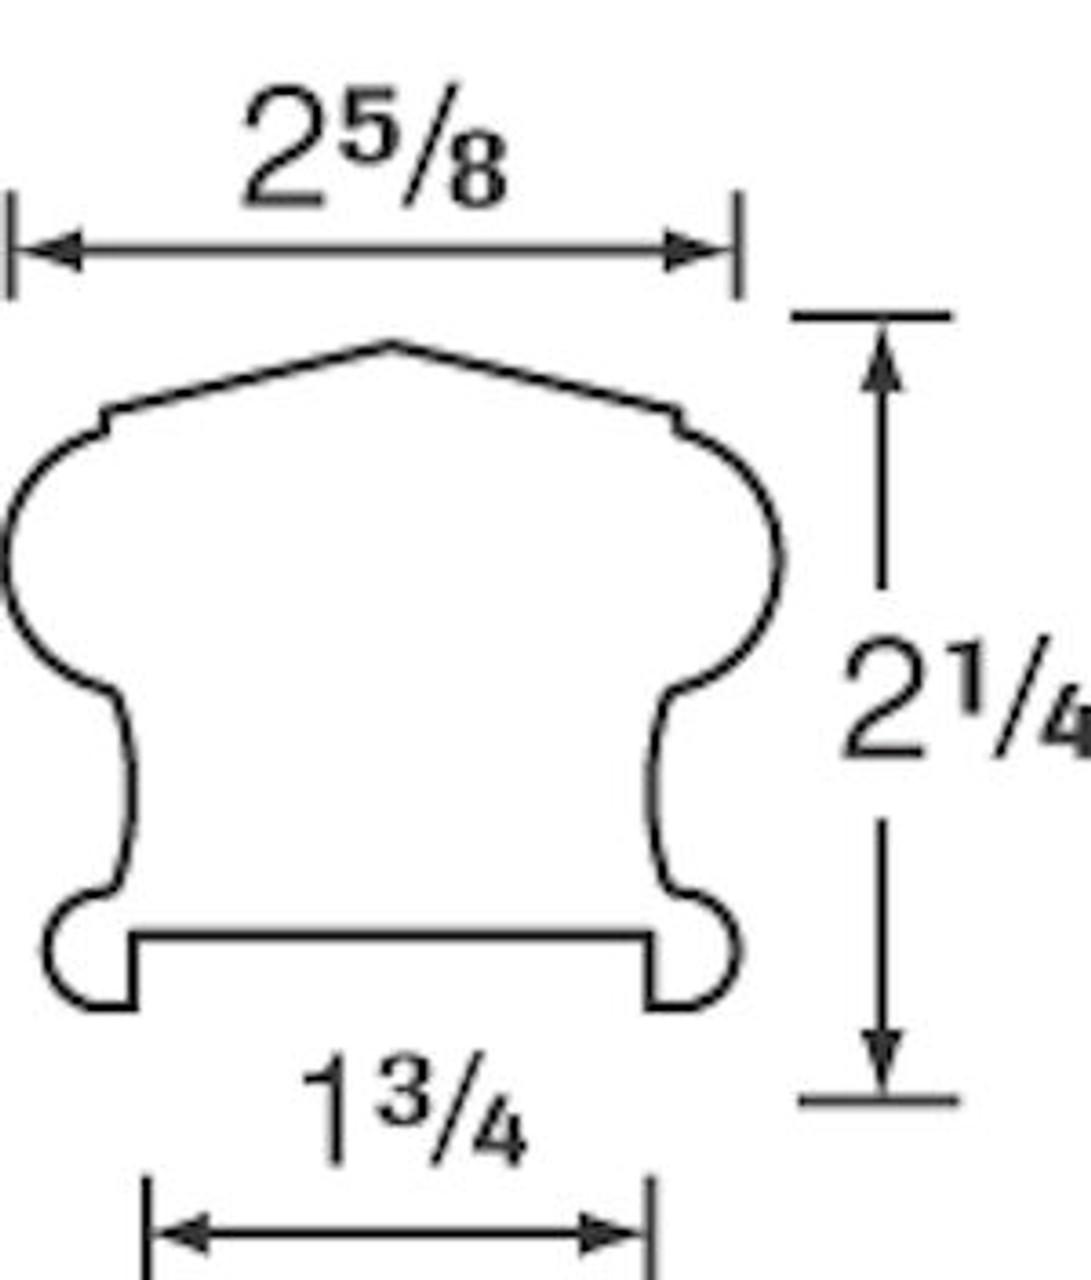 6310 Handrail Dimensional information